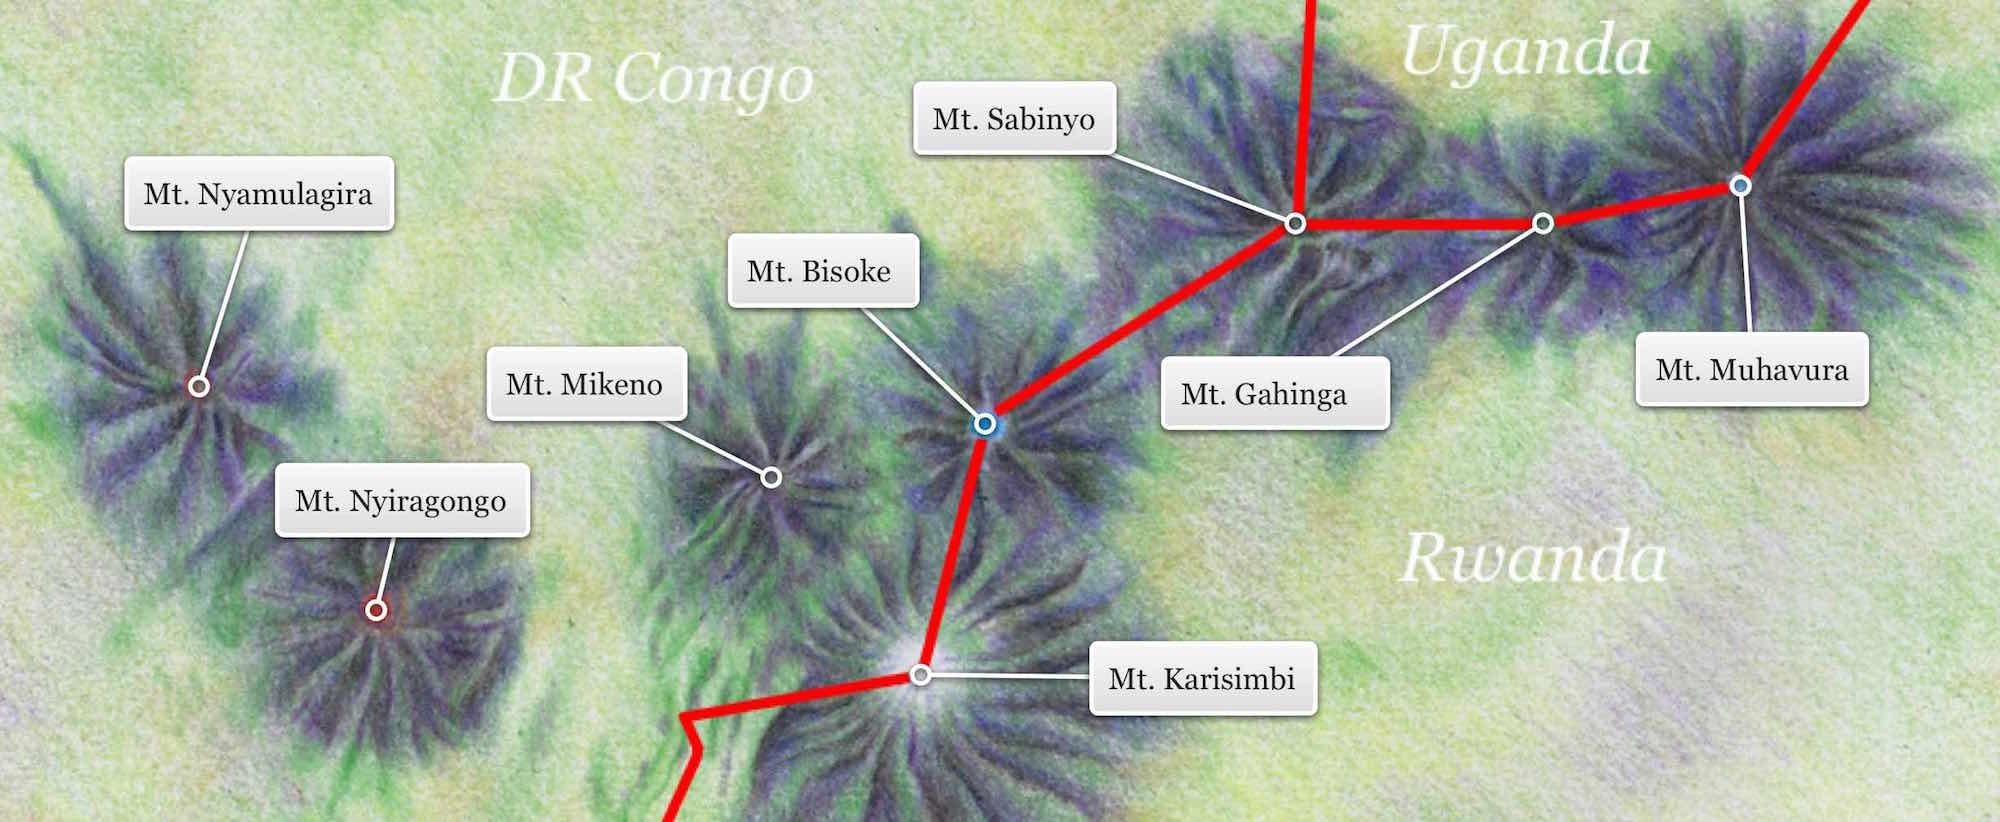 Virunga Volcanoes from the Gorilla Highlands Interactive eBook; illustration by Marcus Aijuka Depories